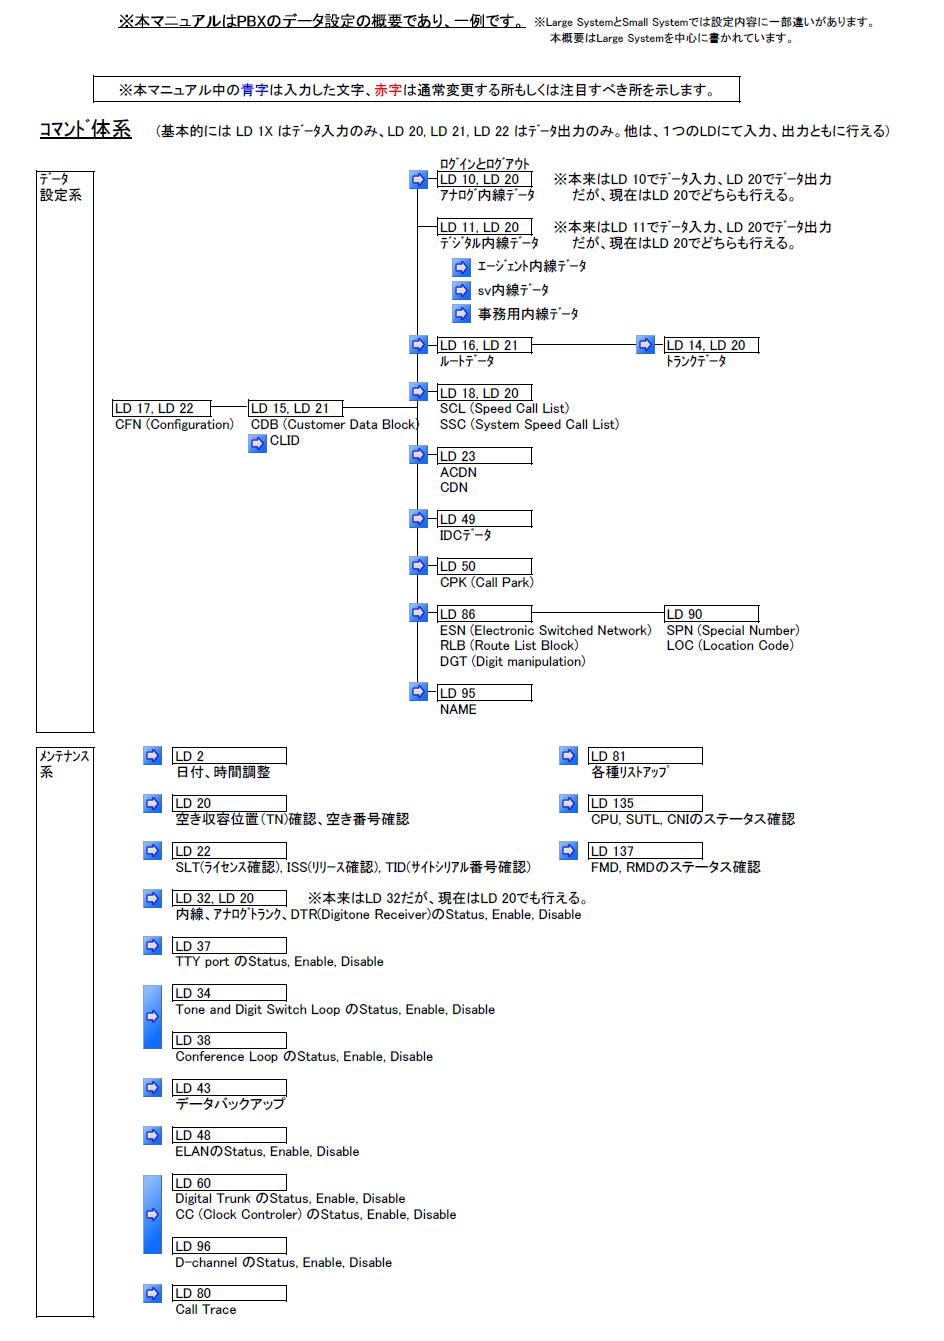 Nortel PBX Data Administration Image